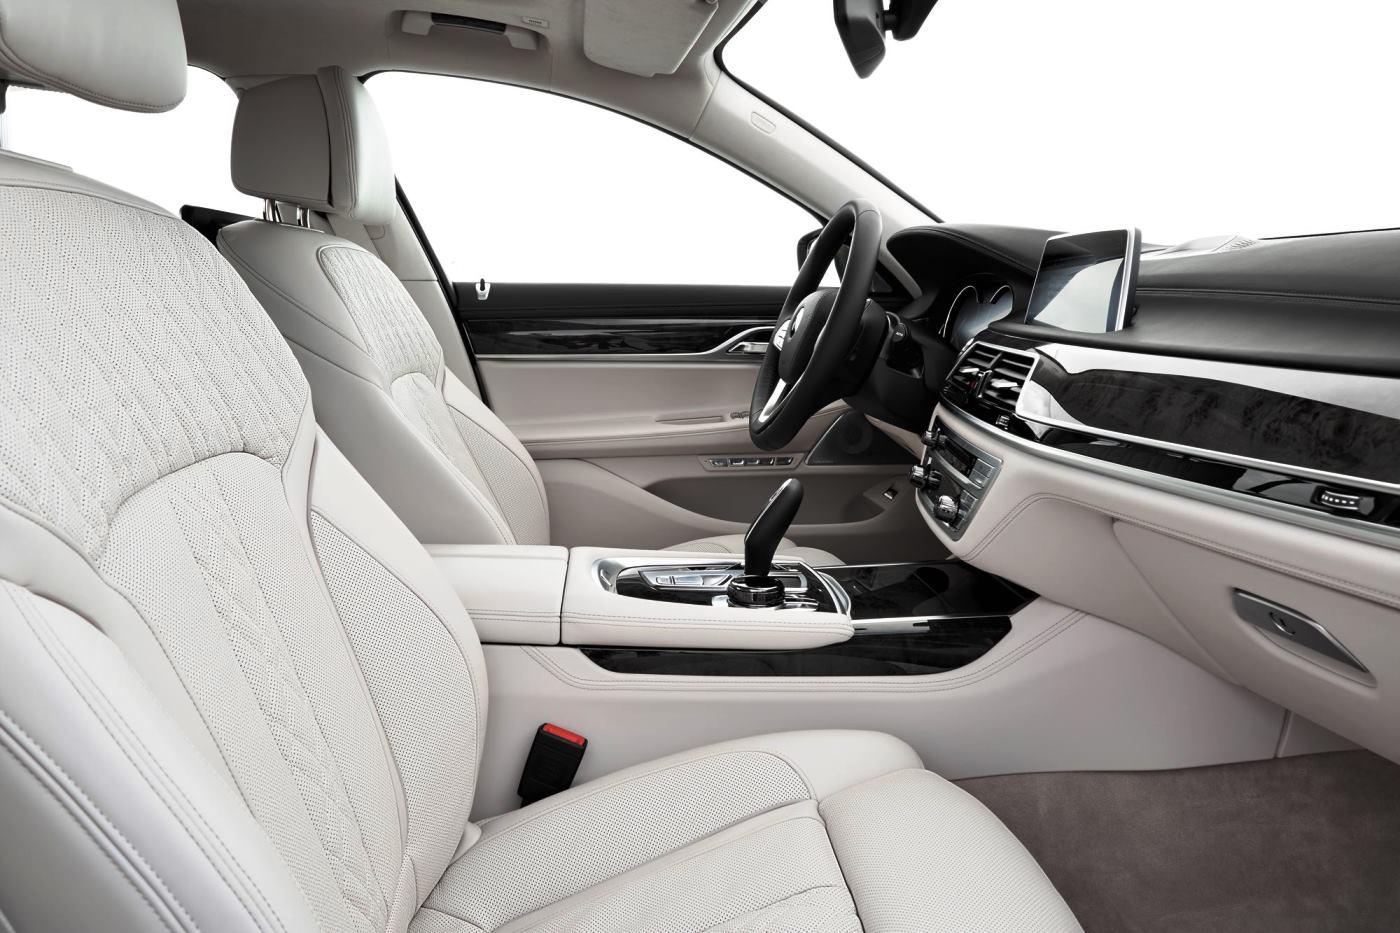 2016 BMW 7 Series Interior Photos 1